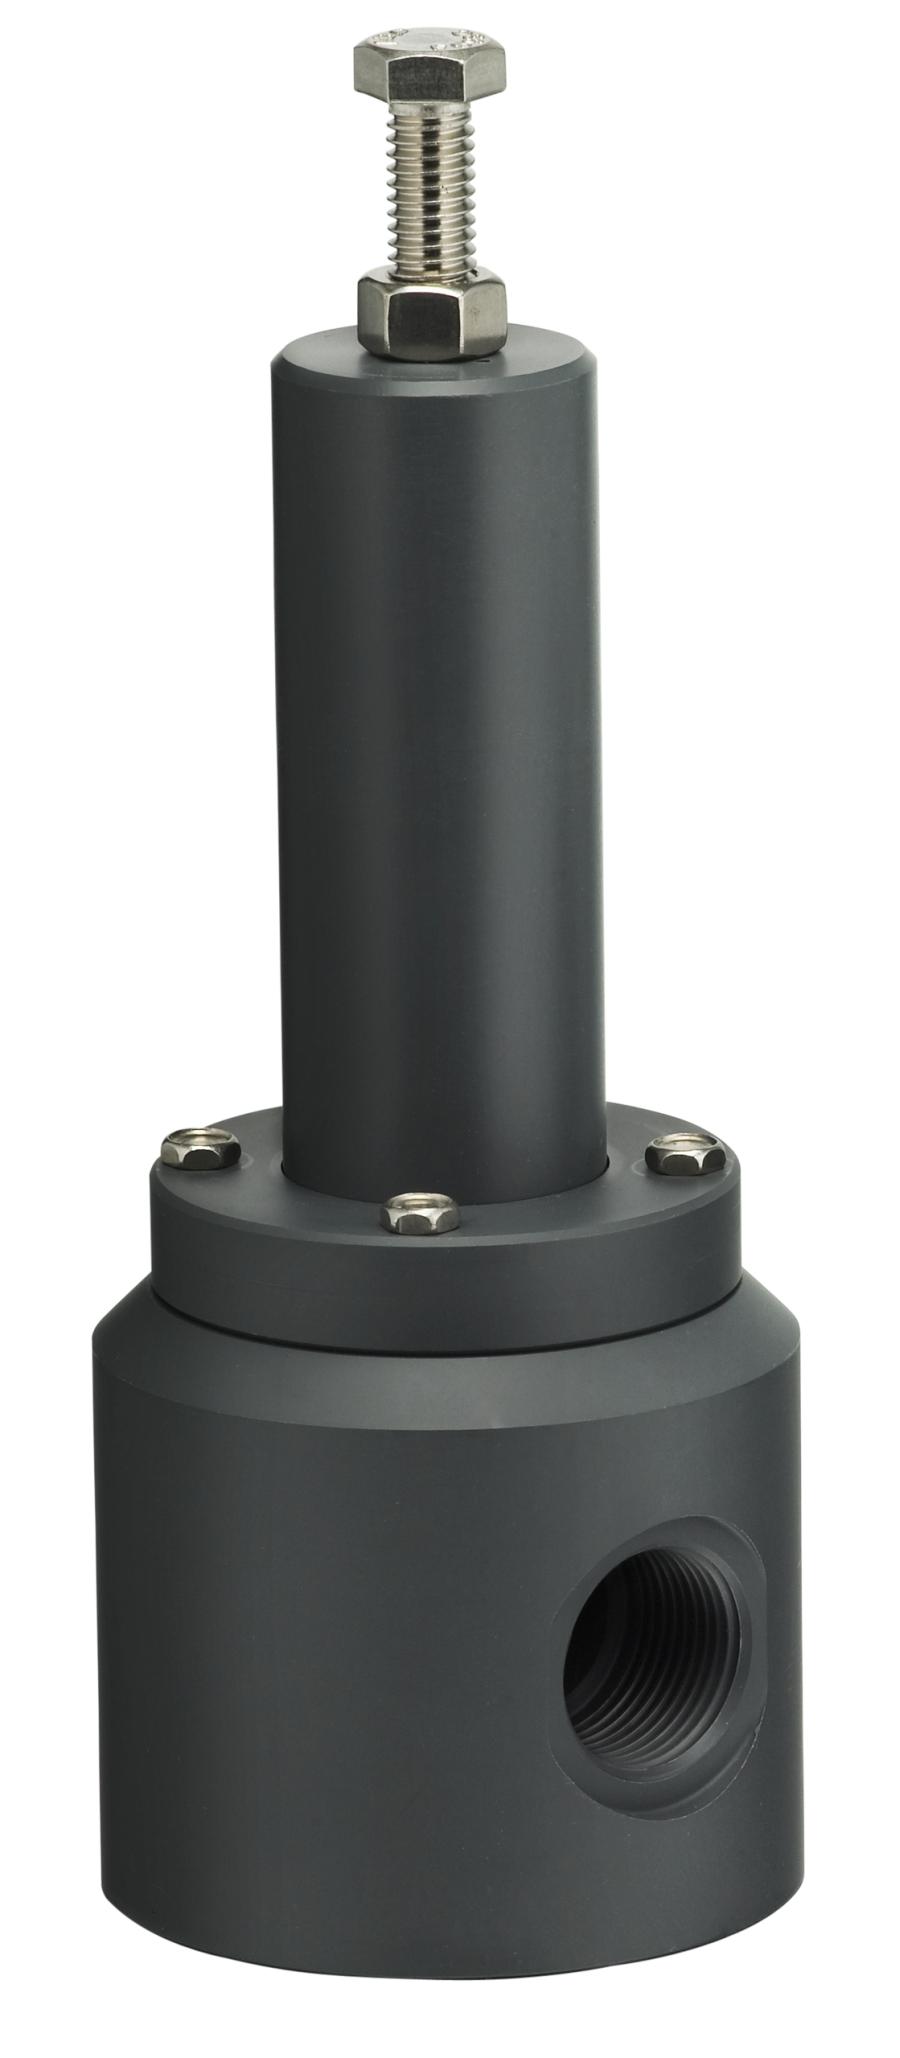 Rvt vs pf plast o matic valves inc